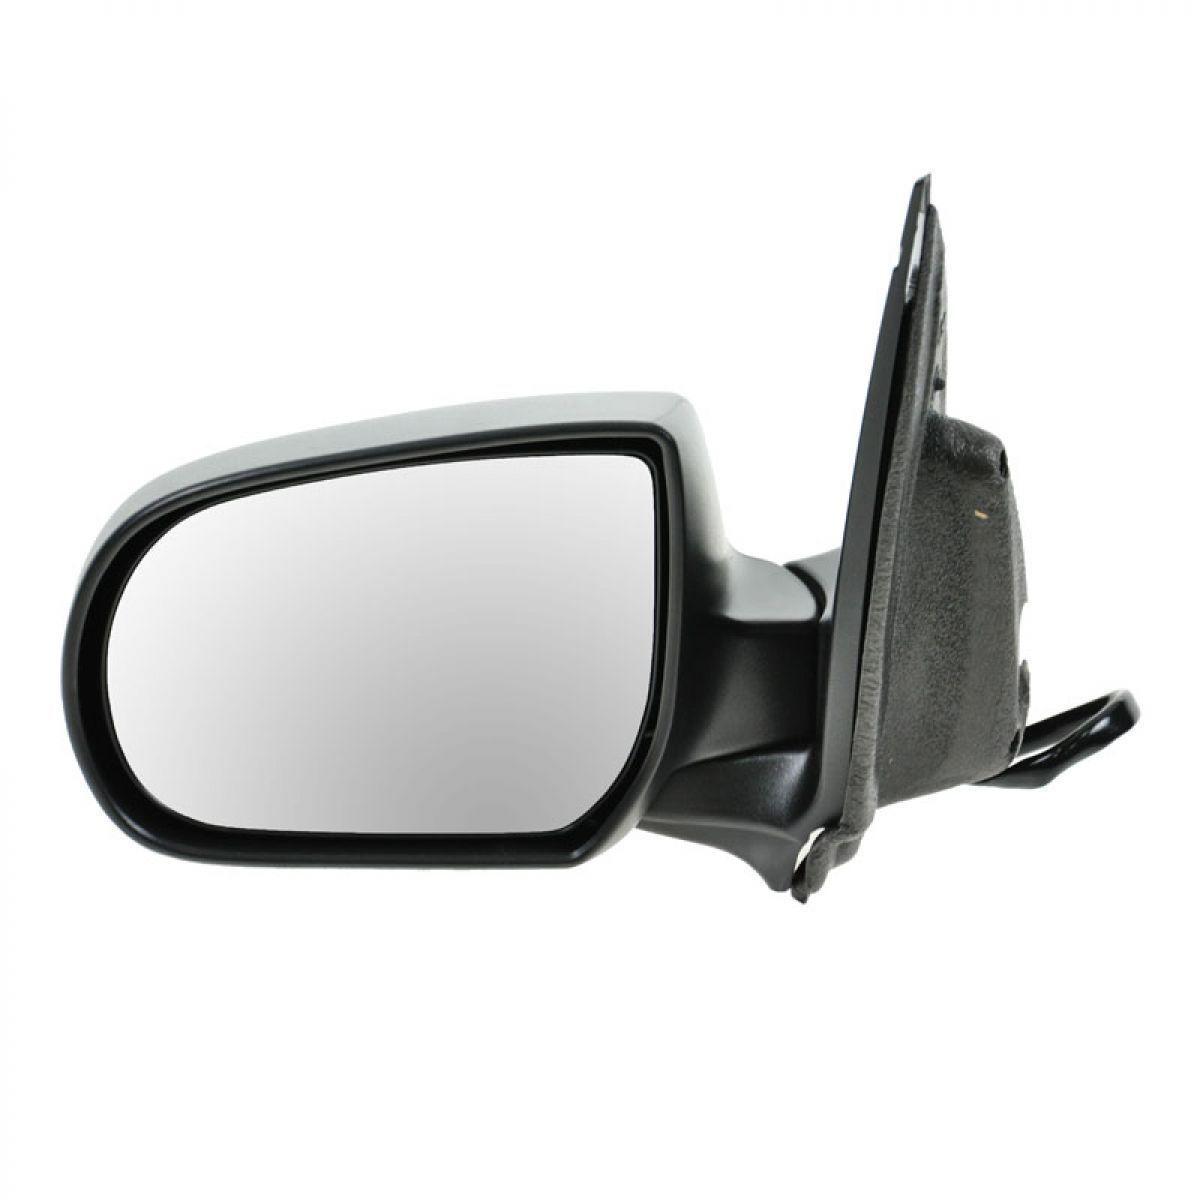 USミラー フォードエスケープマリナーのための新しいドライバーパワーフォールディングミラー/ライフタイム保証付き New Drivers Power Folding Mirror for a Ford Escape Mariner w/Lifetime Warranty